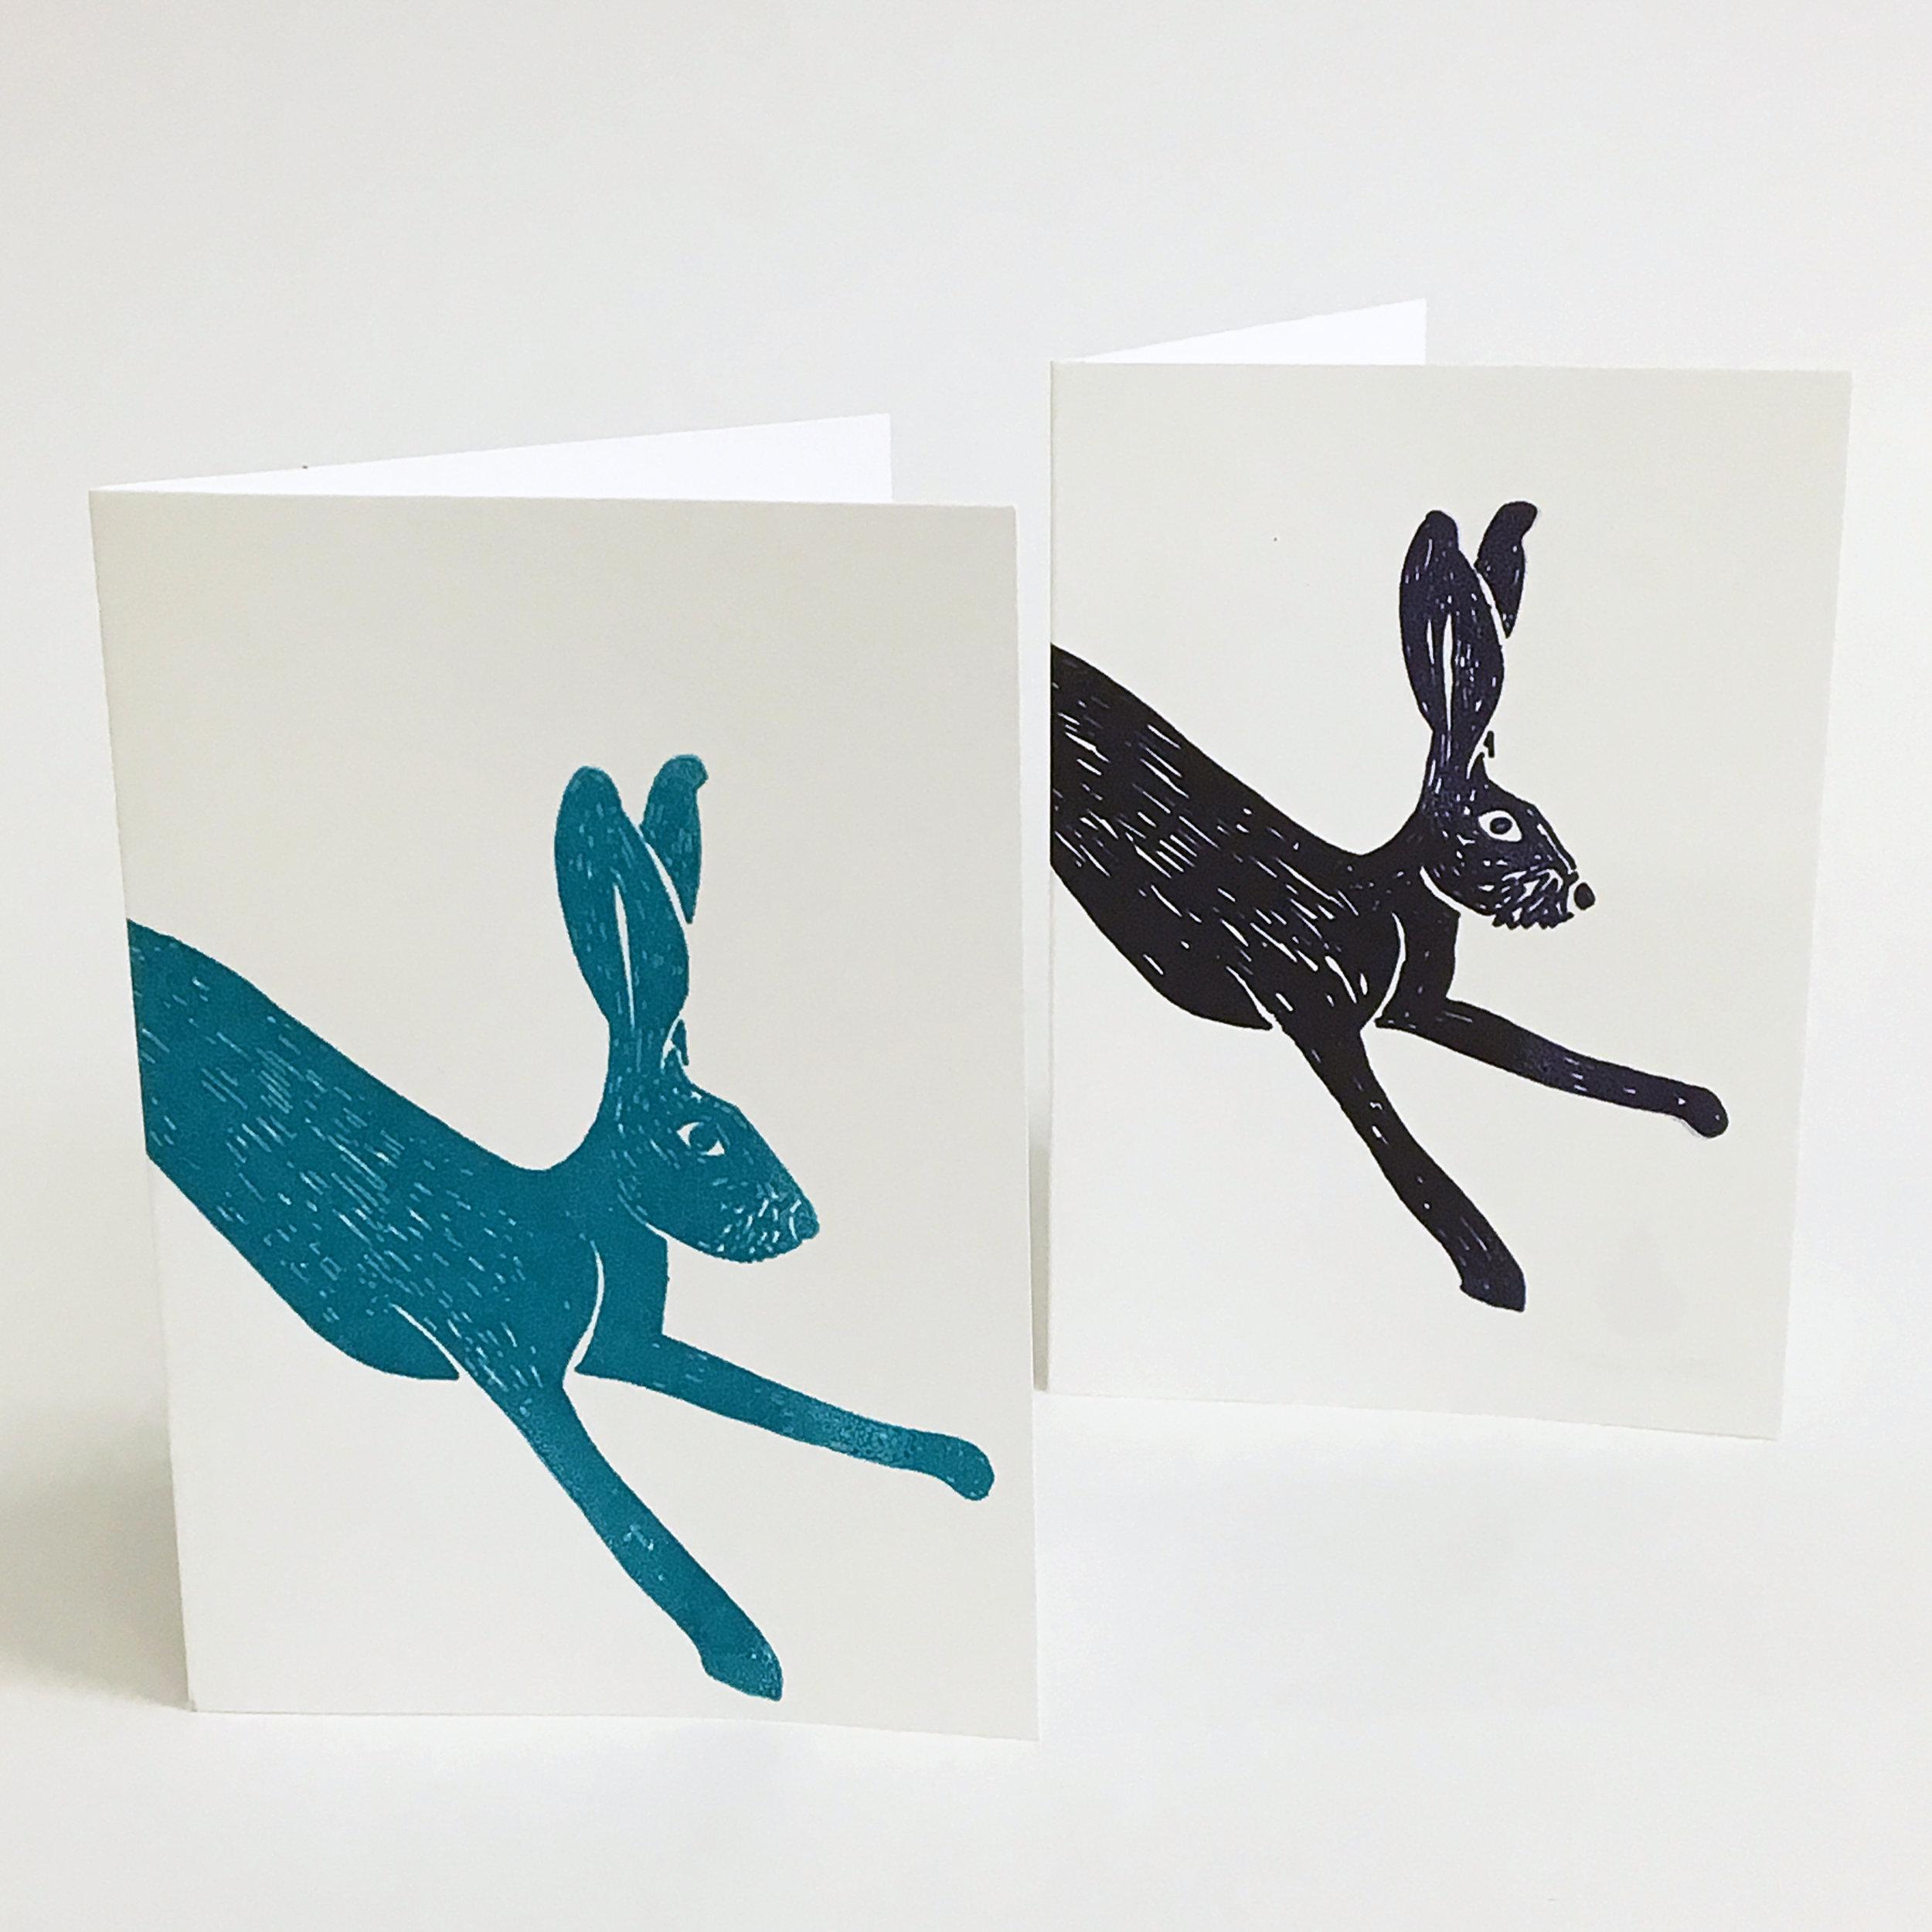 Jane Bain_Hare cards_2_silkscreen print.jpg